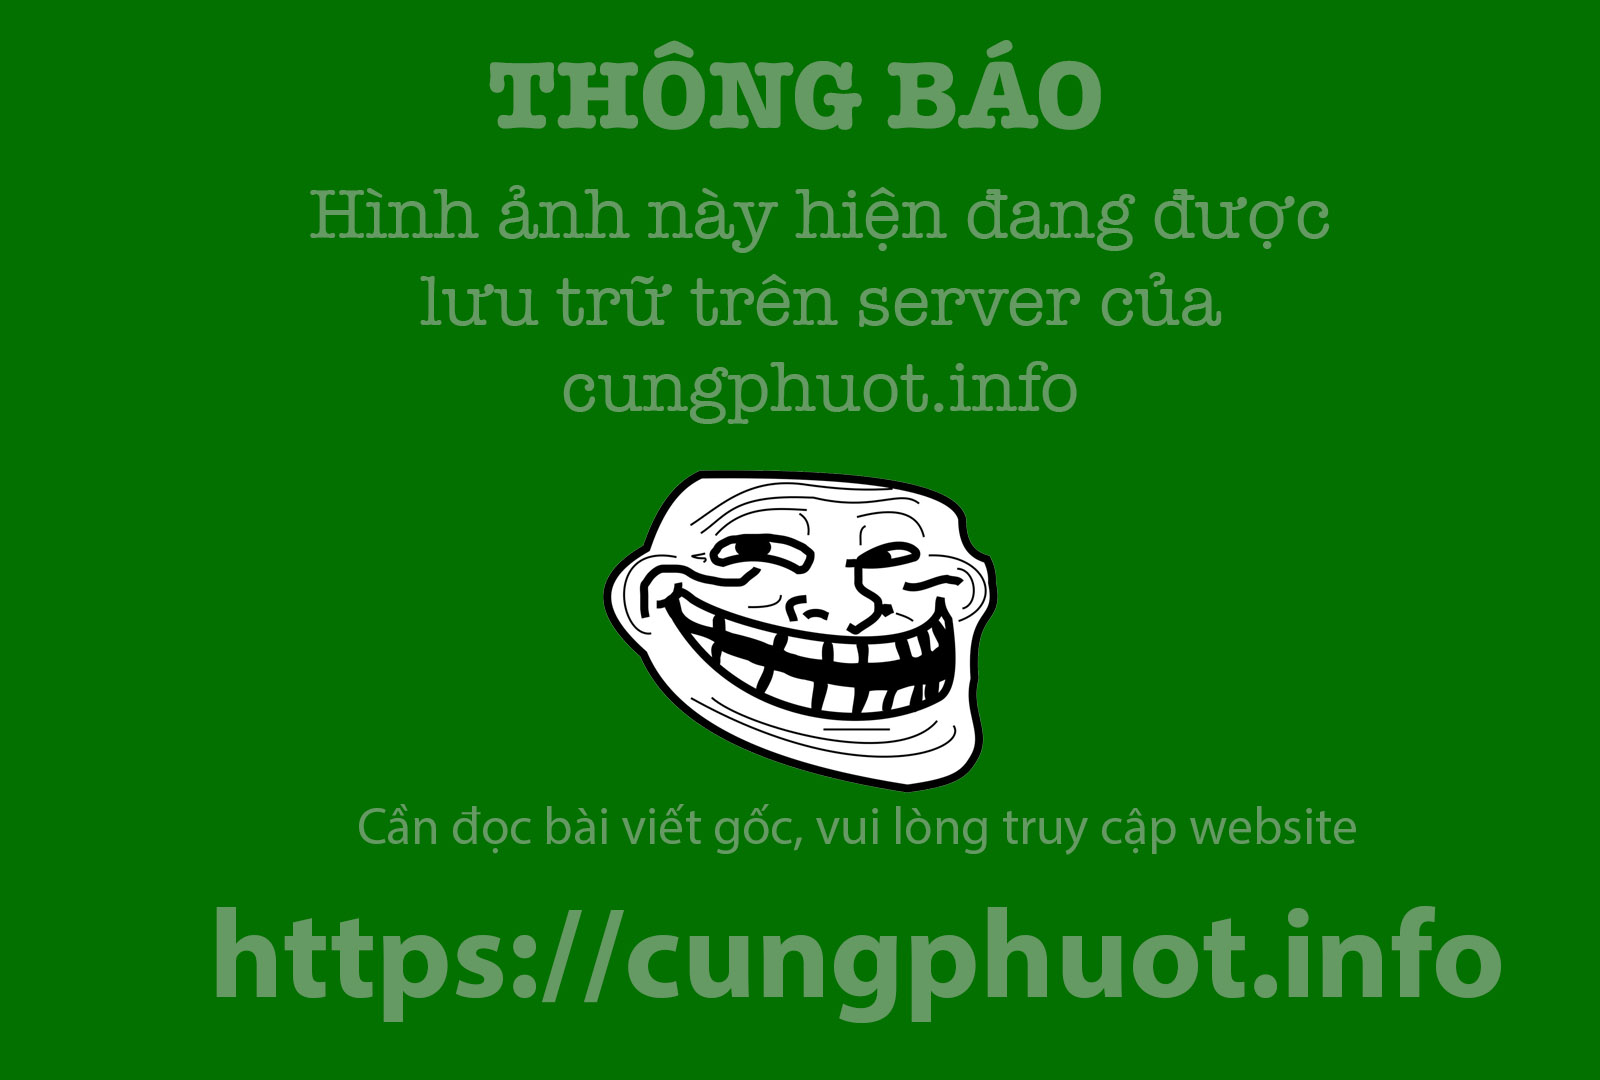 Ve dep thanh cao, huyen bi cua Dan vien Chau Son hinh anh 8